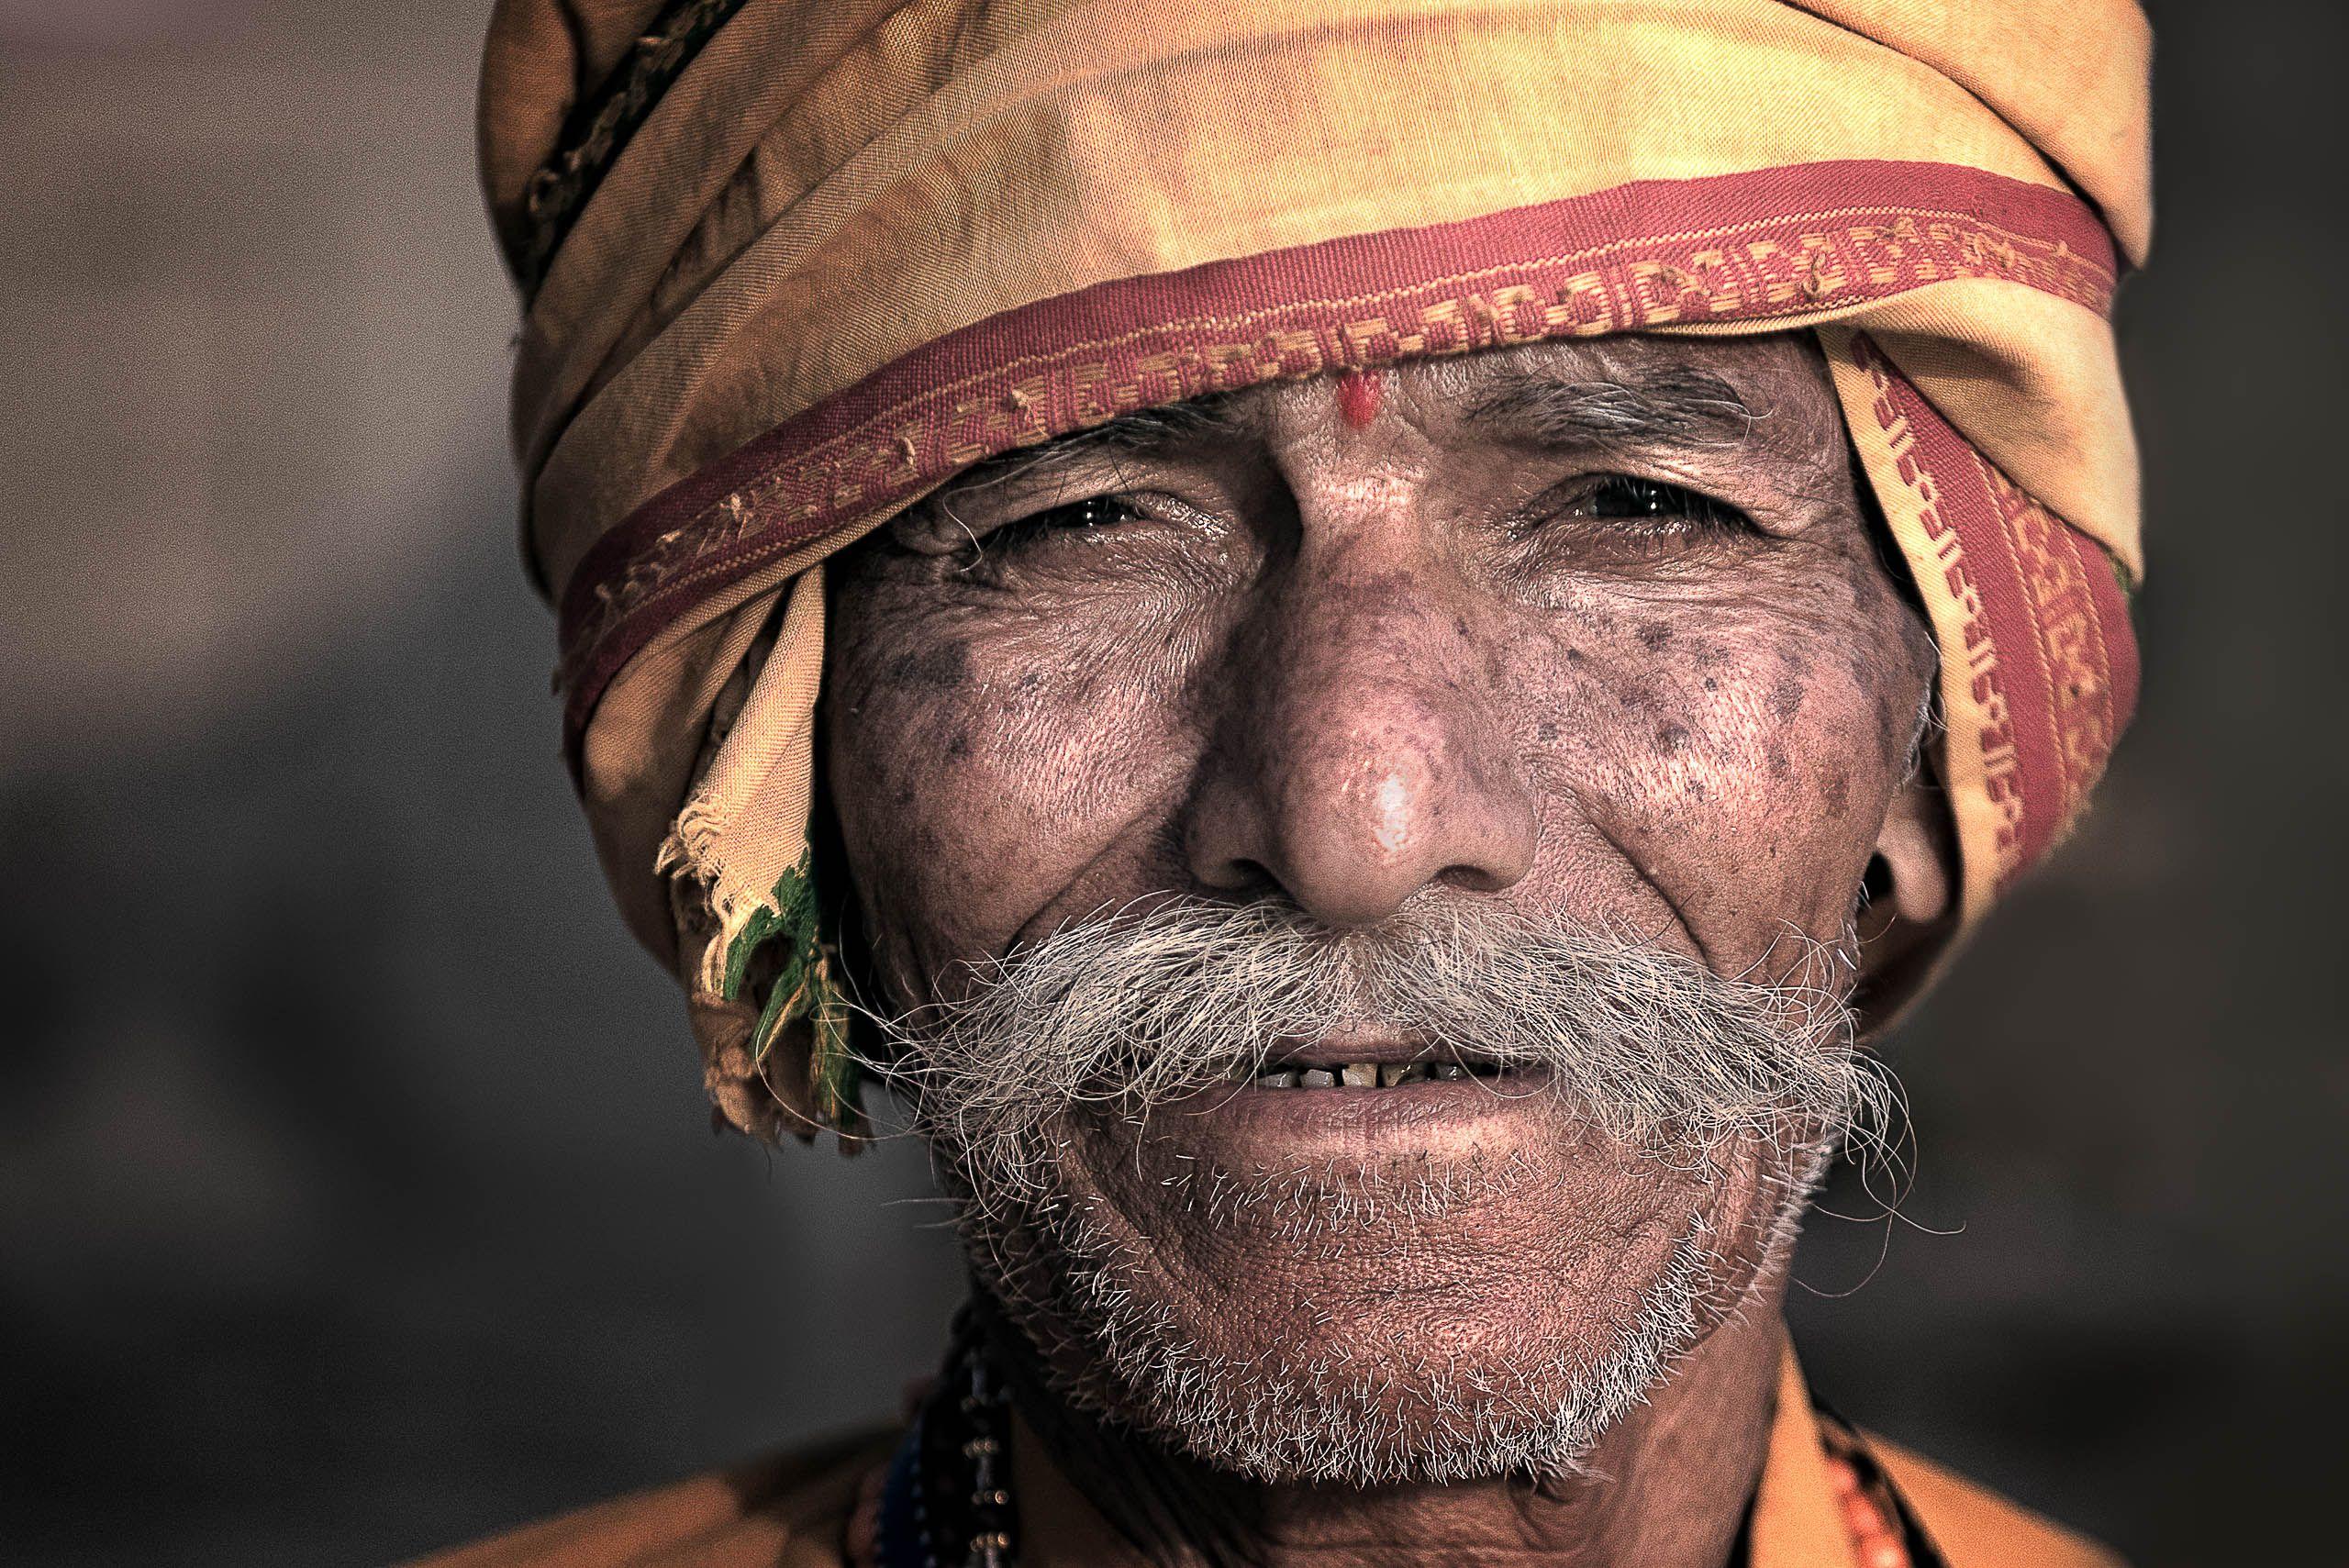 Kumbh mela pilgrim kumbh mela india mela